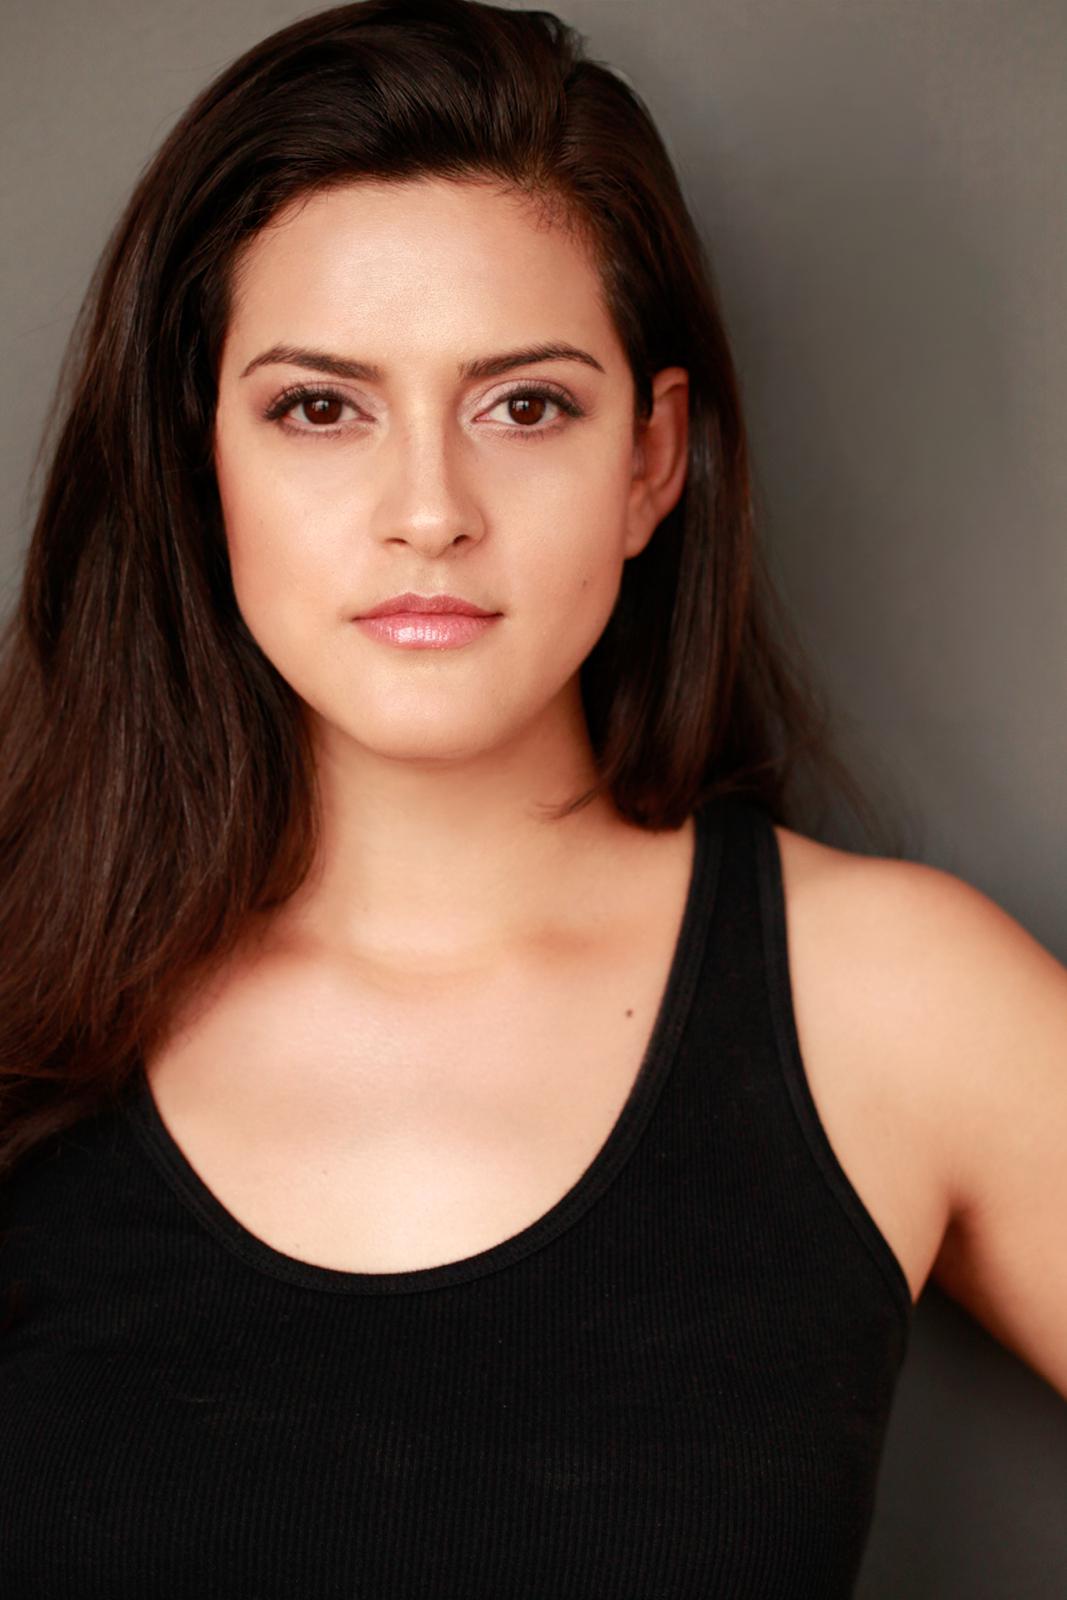 Diana Elizabeth Torres